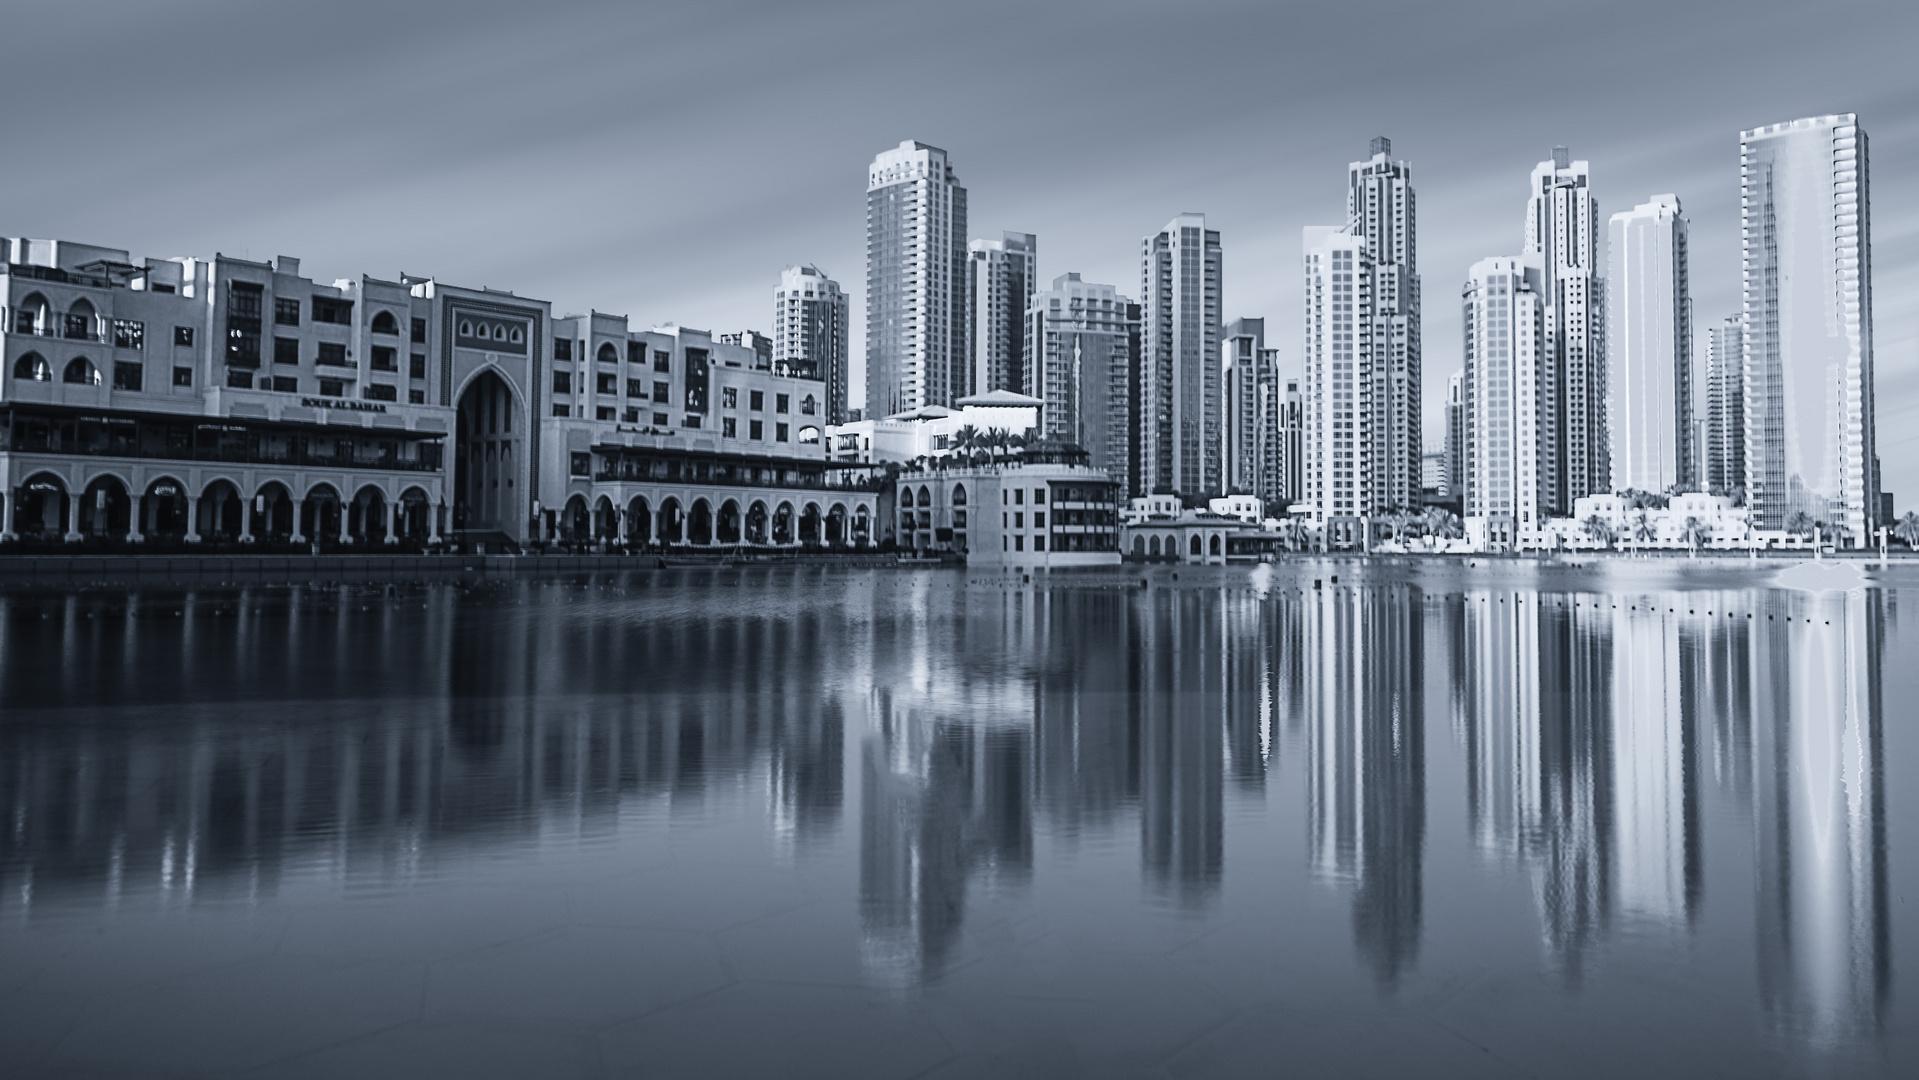 Dubai Impression #1